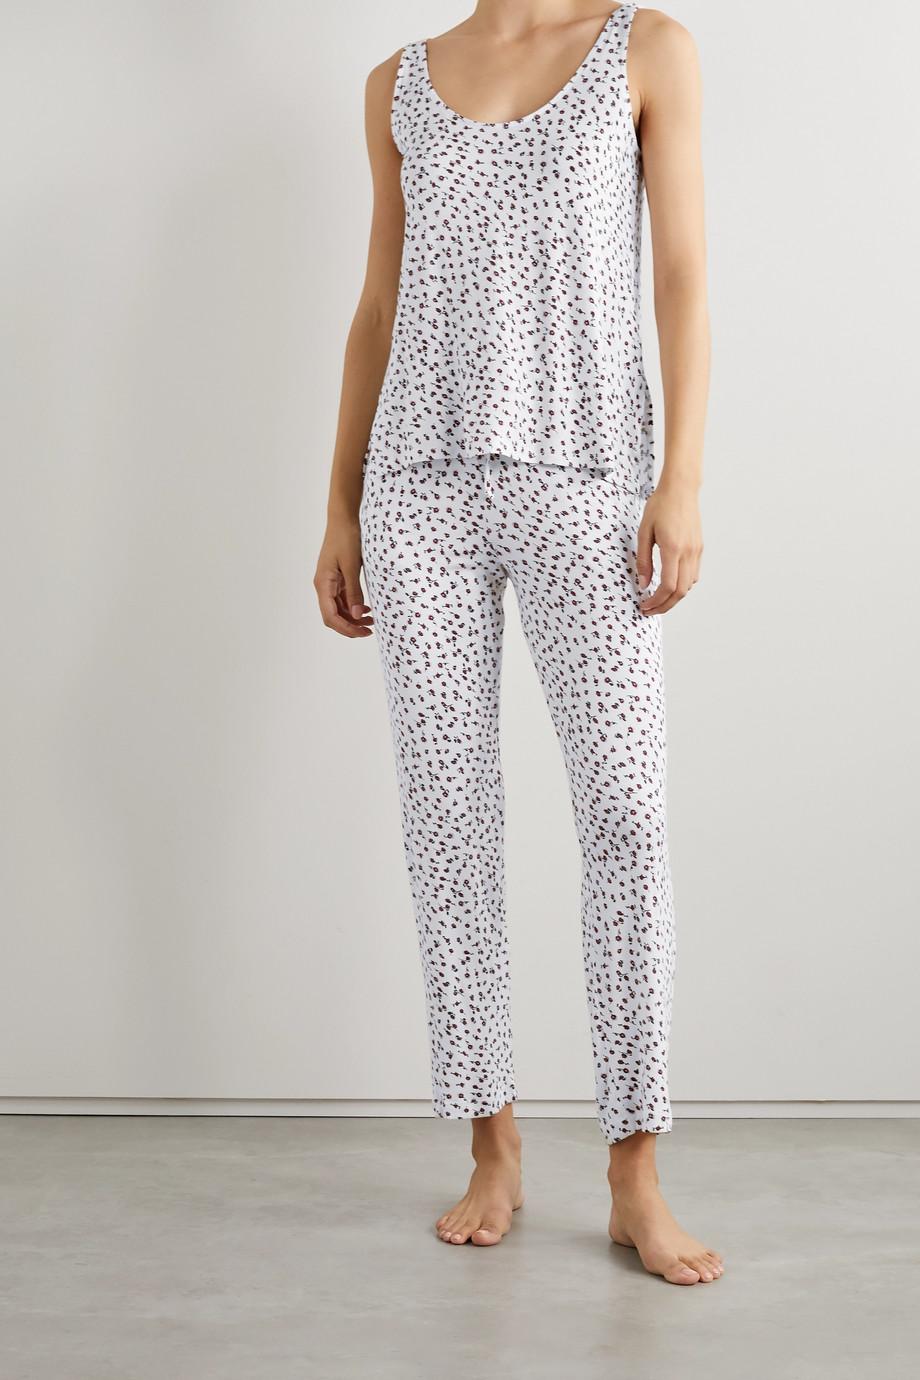 LESET Nora Pyjama aus Stretch-Modal mit Blumenprint